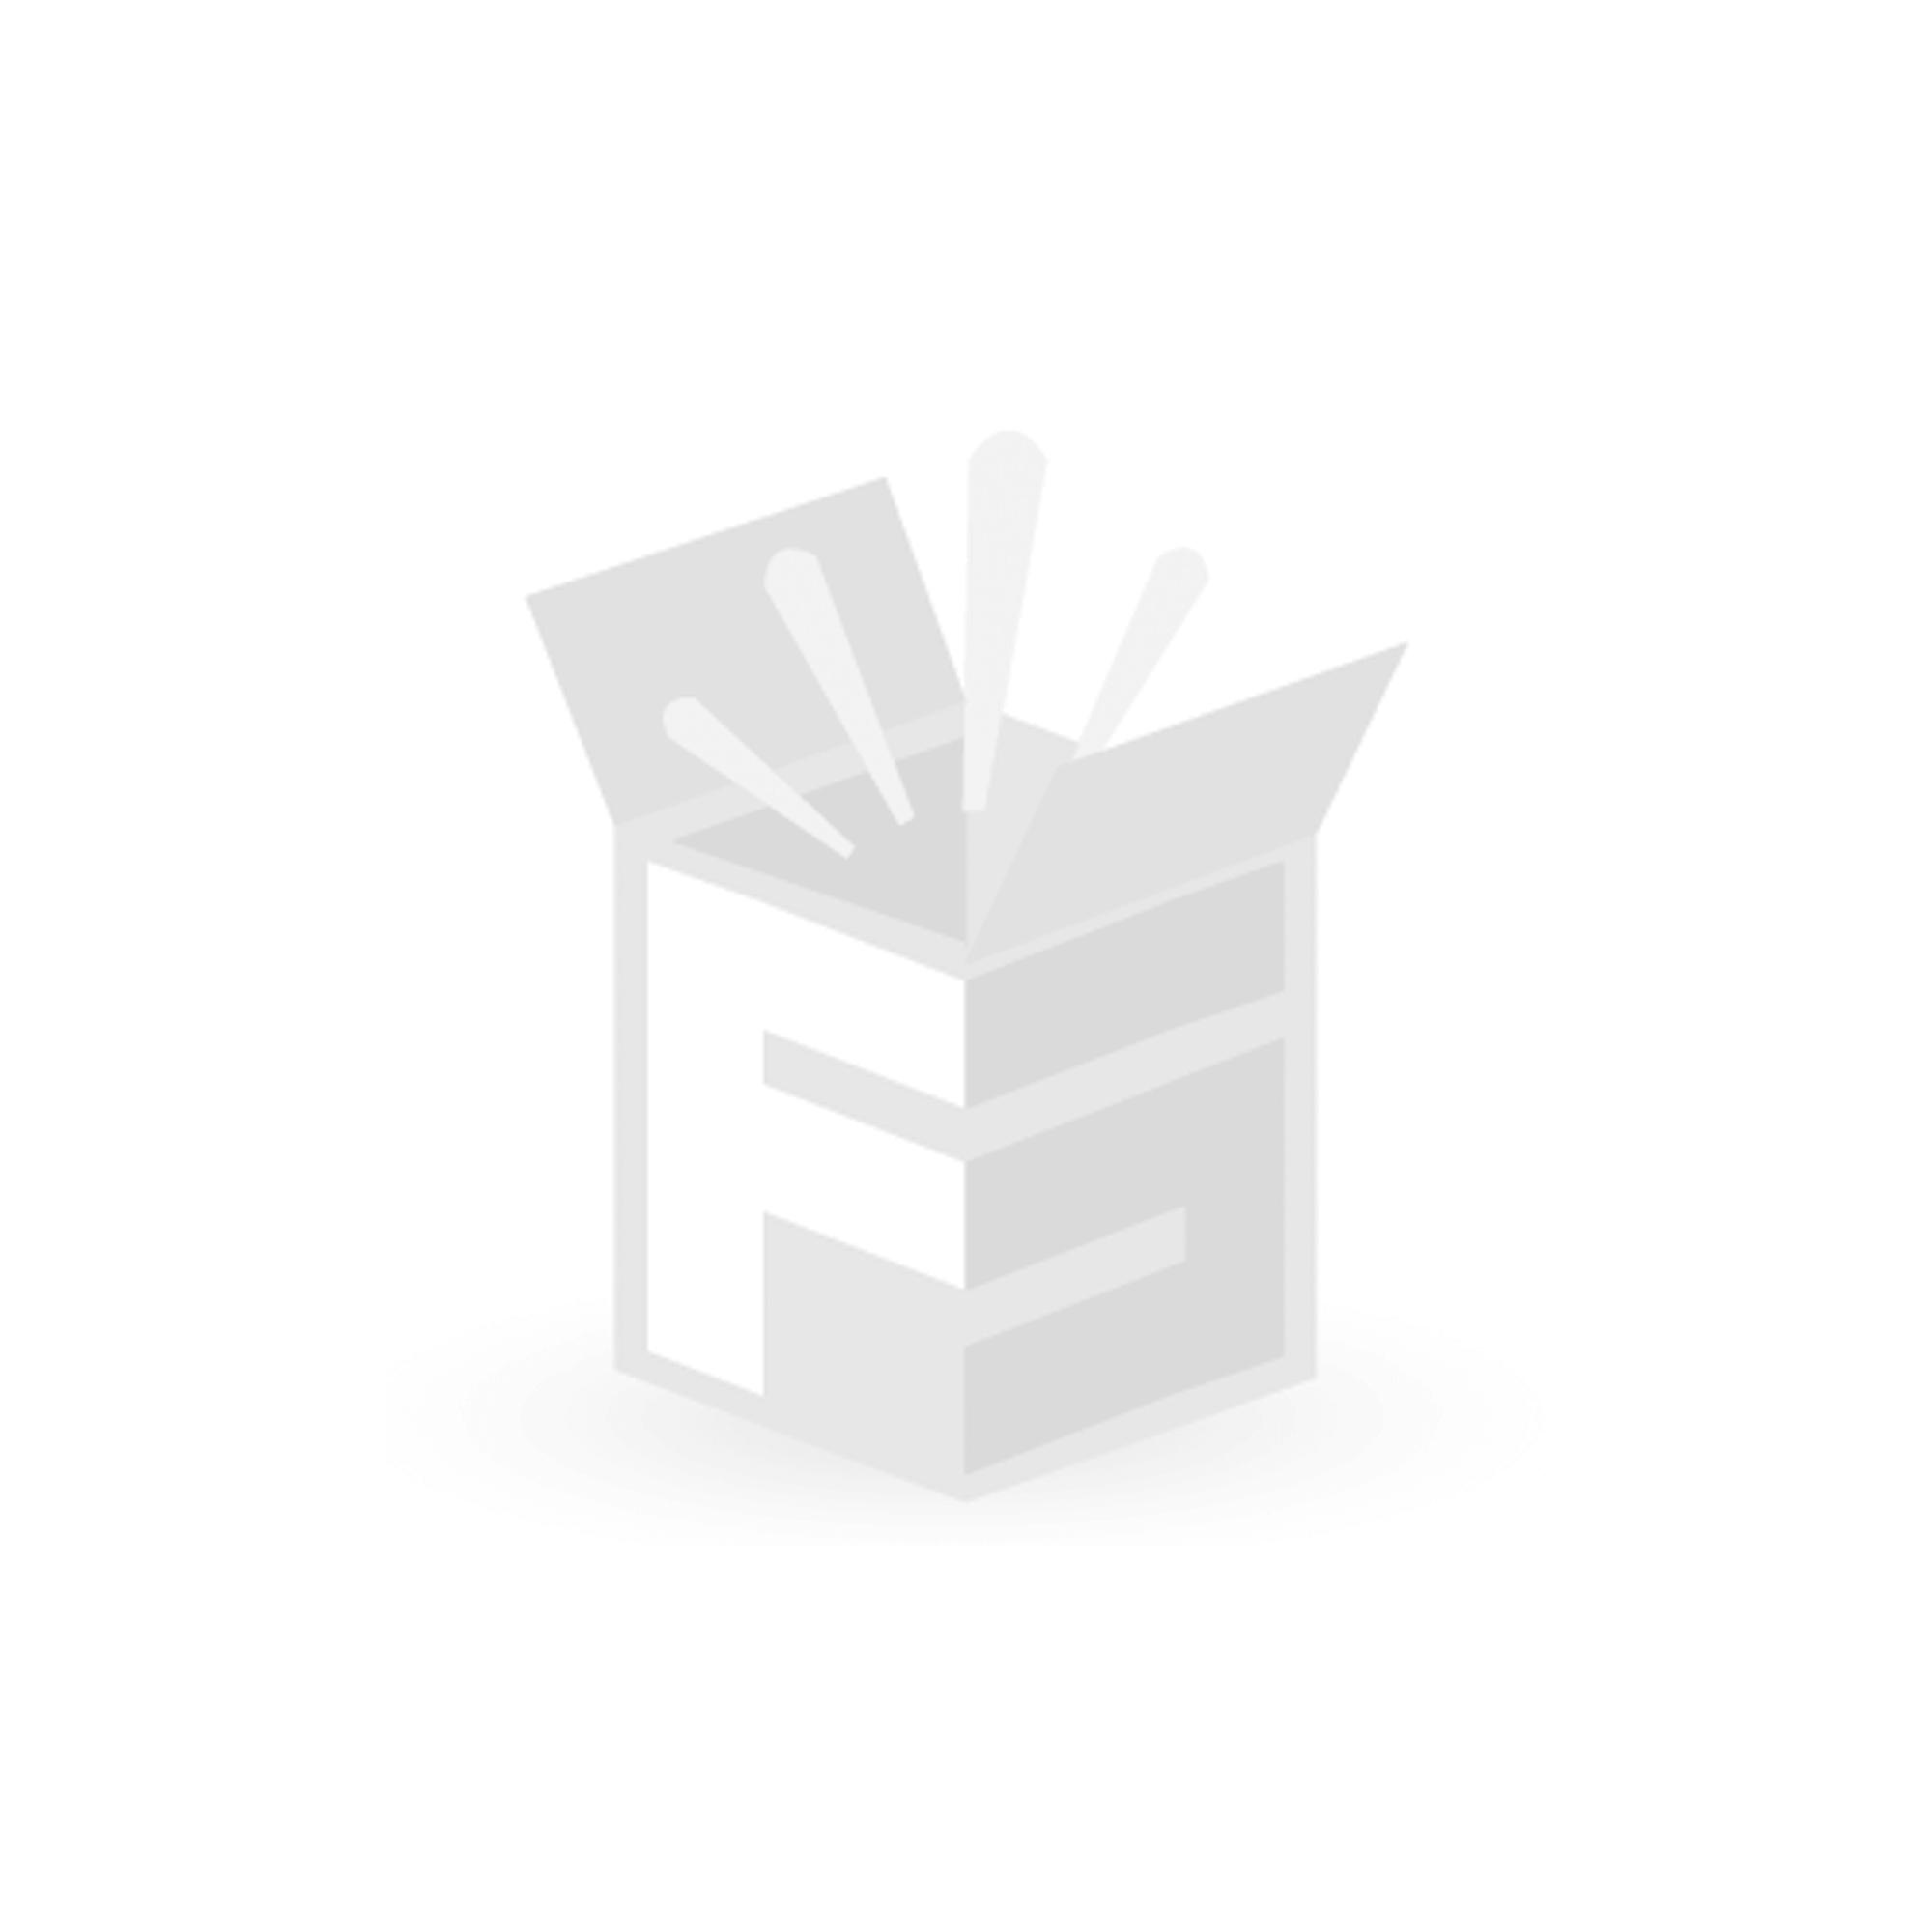 Kibernetik Kupplung 1x CEE63A, 5-polig